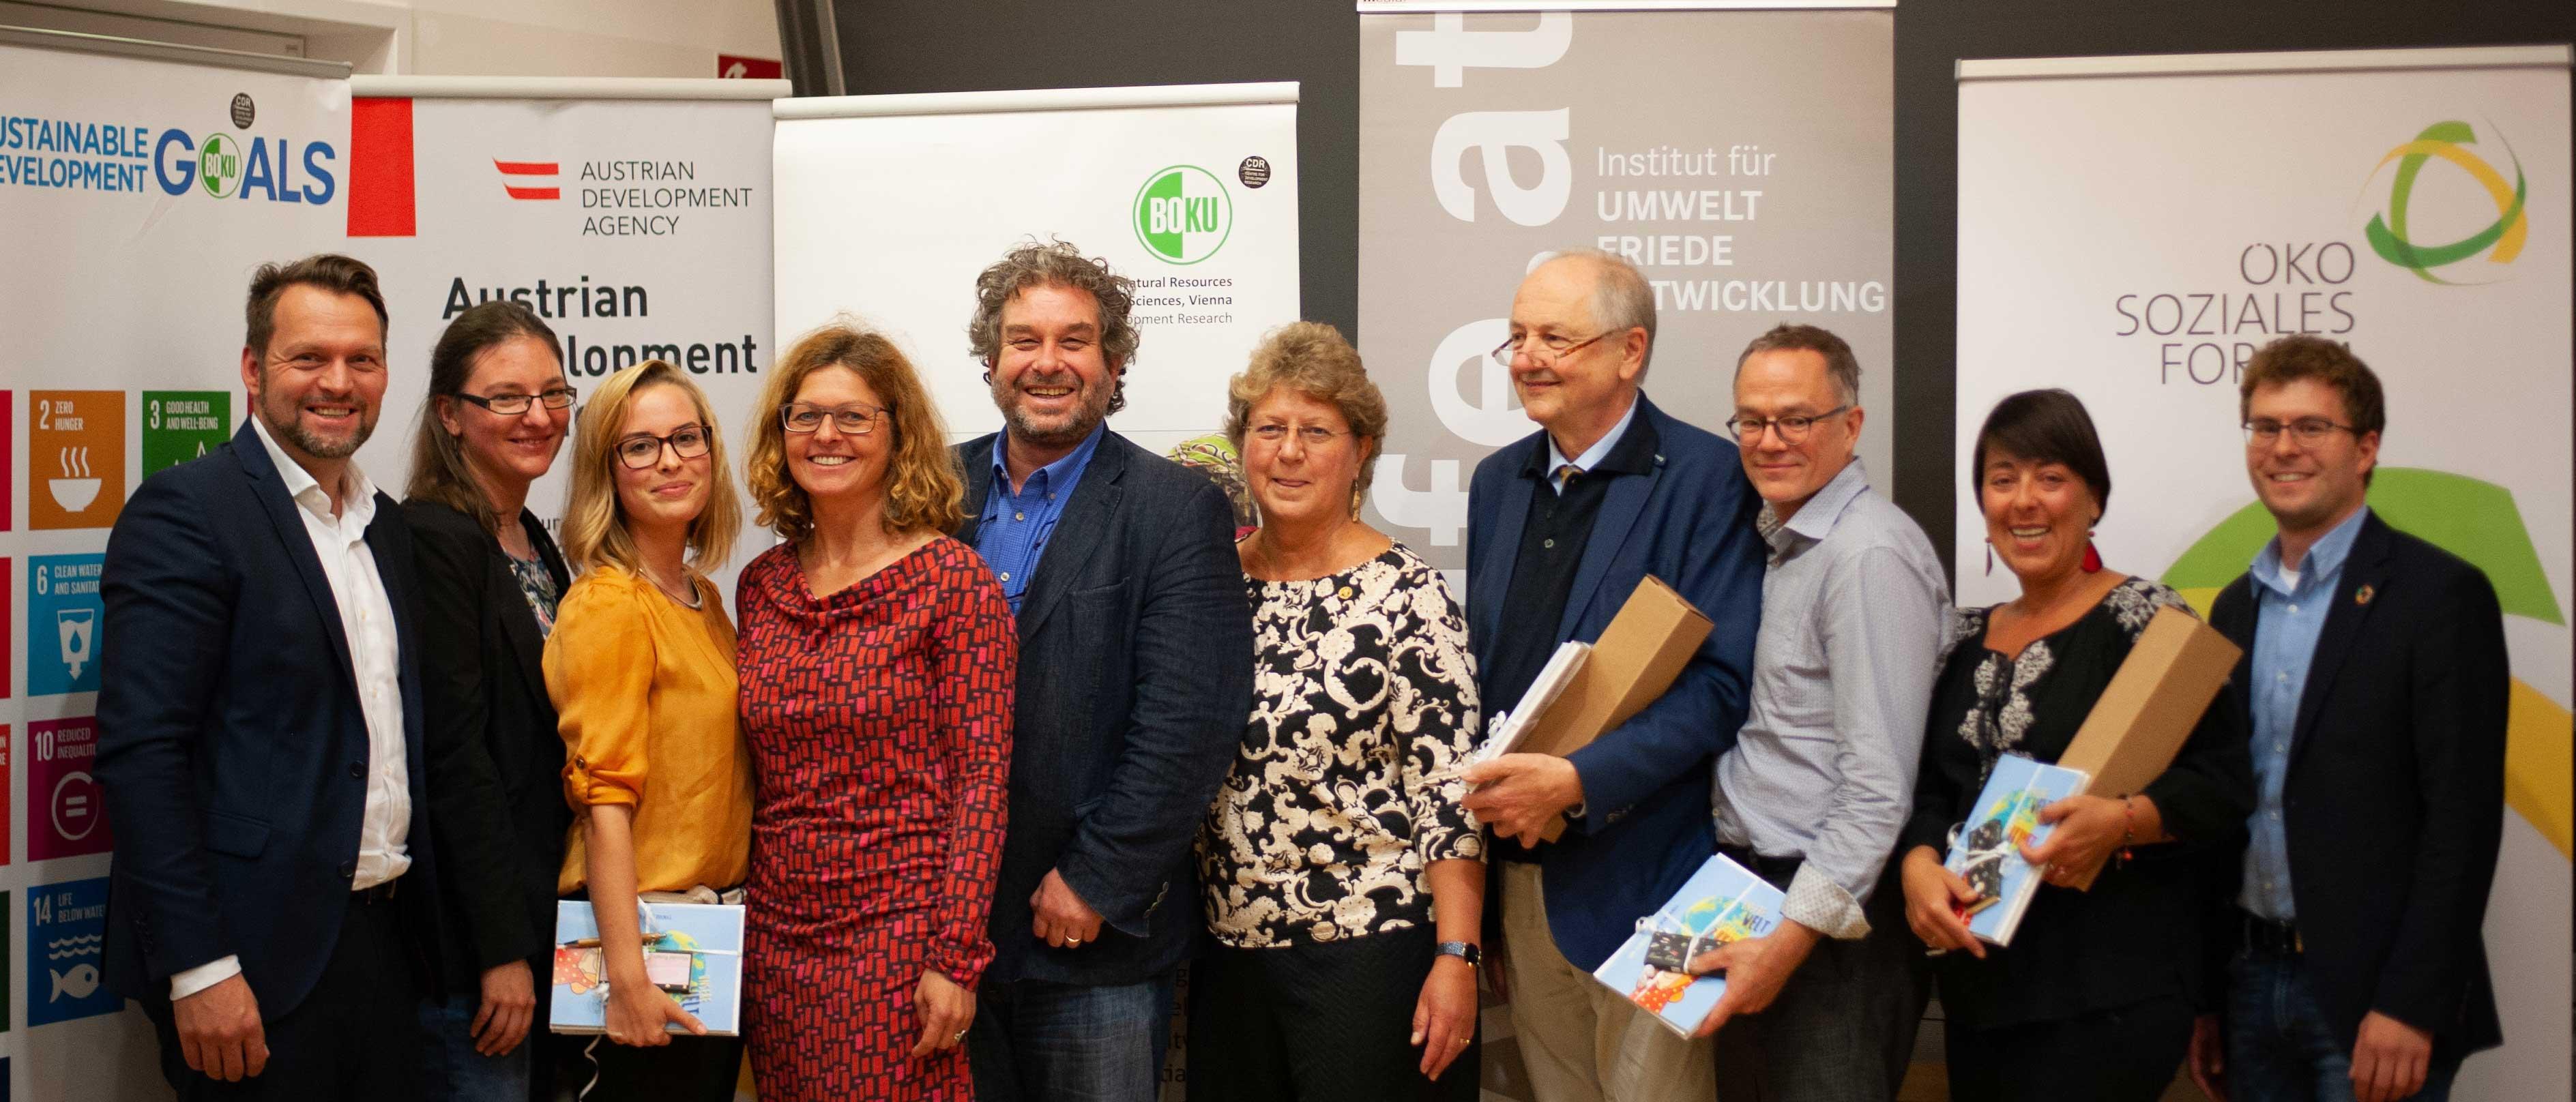 v.l.n.r.: Hans Mayrhofer (Ökosoziales Forum), Rosana Kral (CD-BOKU), Laura Hundscheid, Almut Knaller, Andreas Welcher (CDR-BOKU), Rebecca Metzger, Herwig Waidbacher, Marc Mößmer, Moderatorin Maiada Hadaia und Florian Leregger (IUFE).